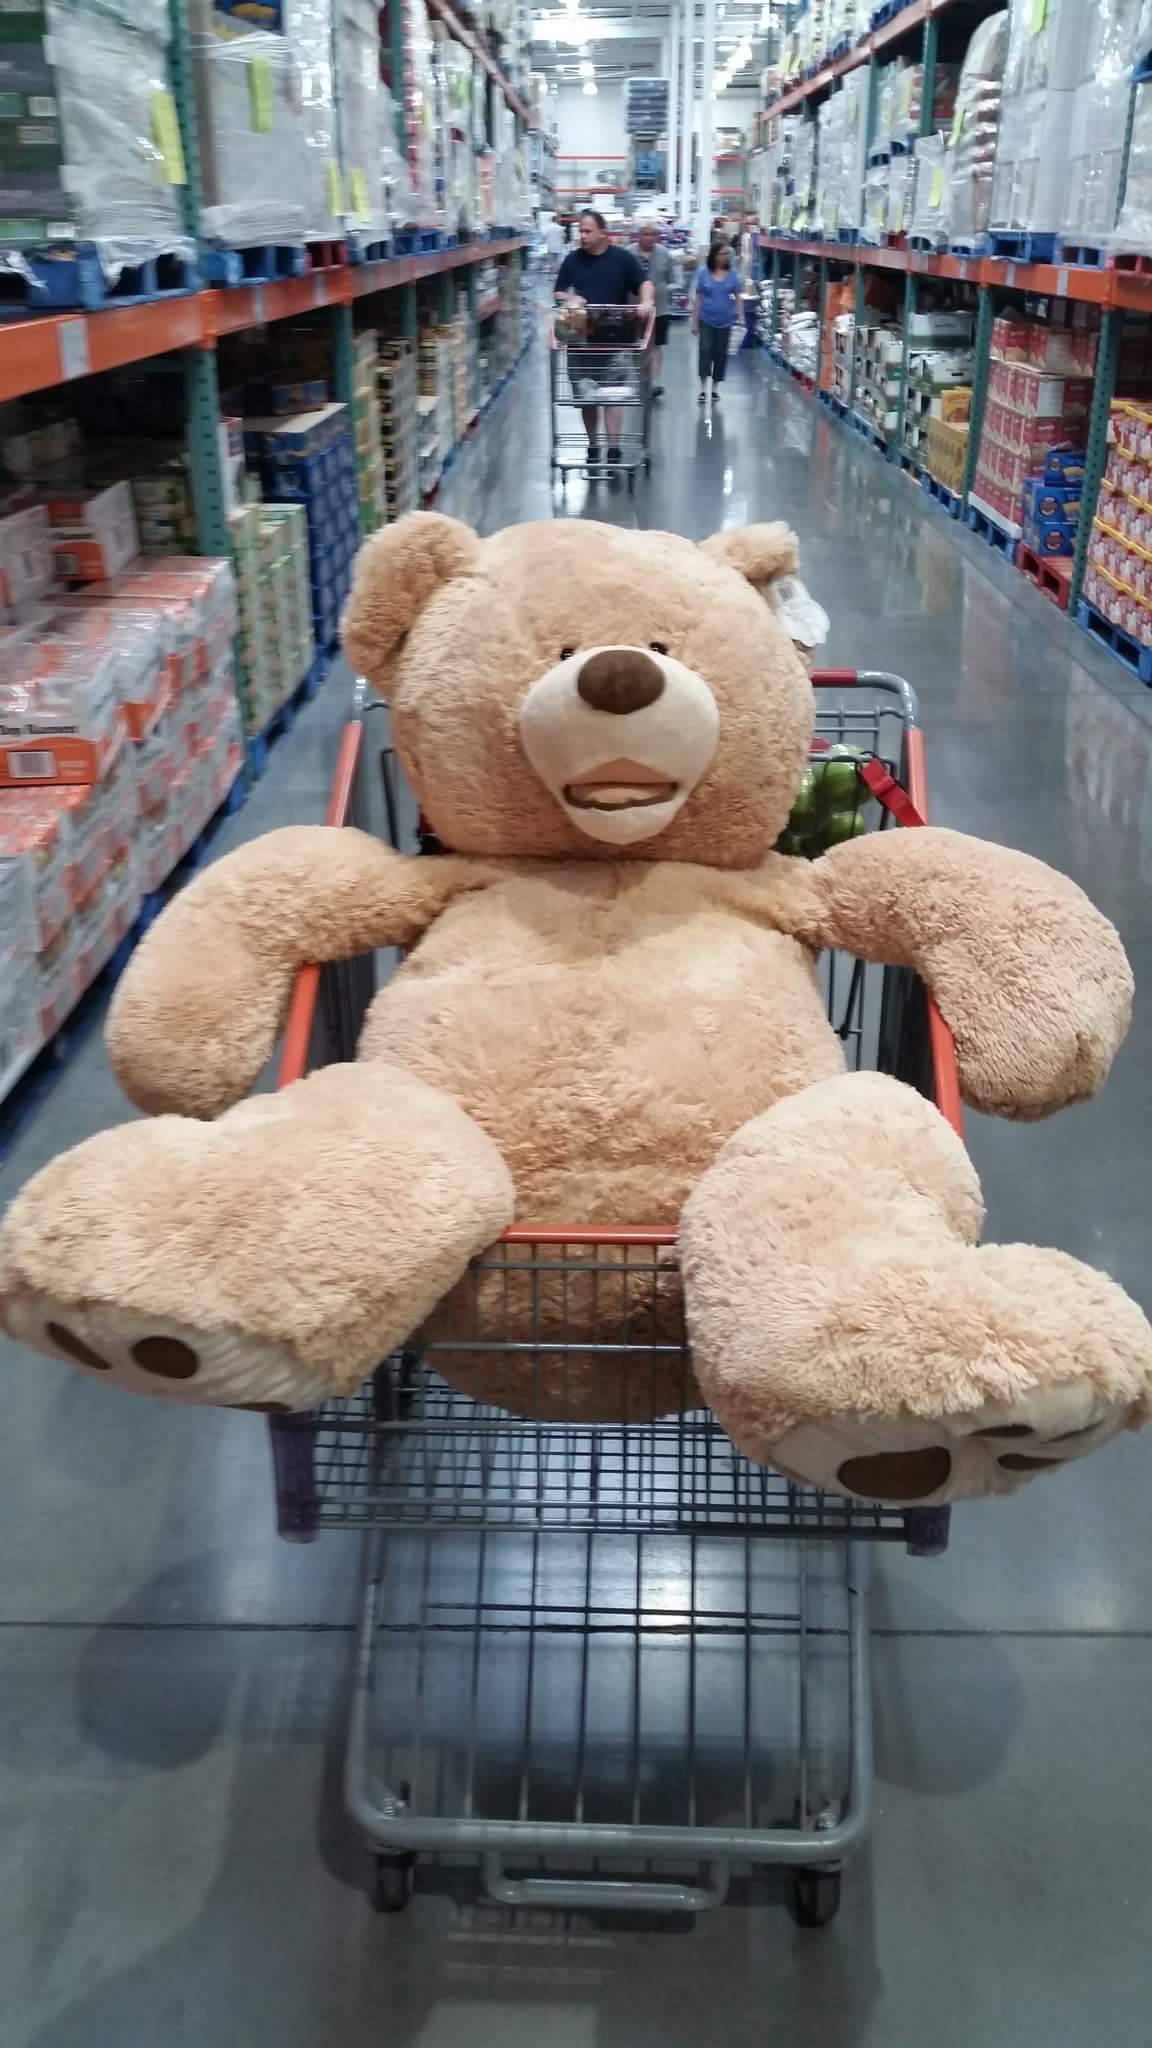 Bad teddy bear blank template imgflip bad teddy bear template maxwellsz